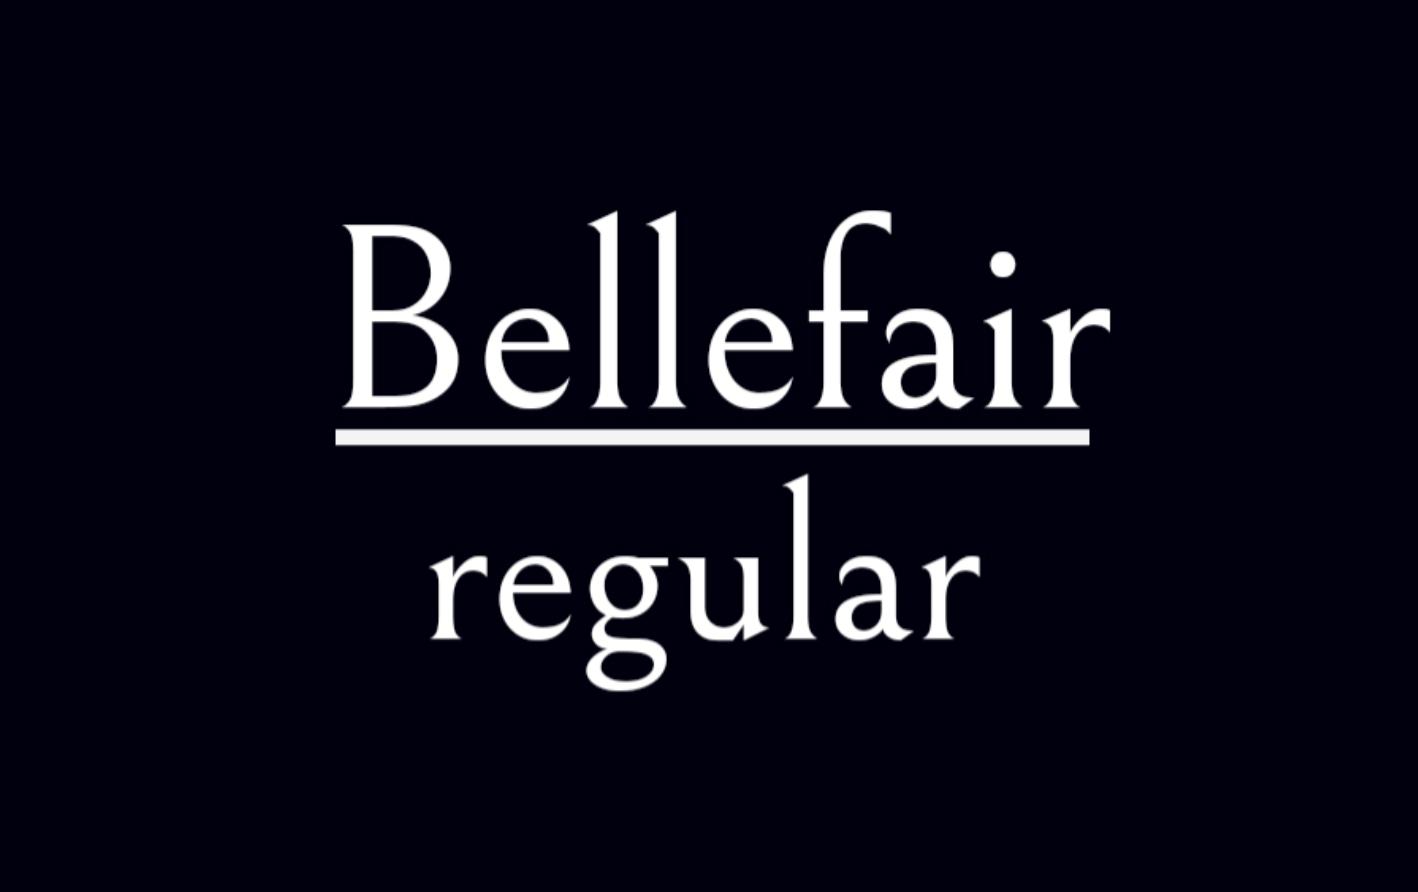 serif fonts for dyslexic reader